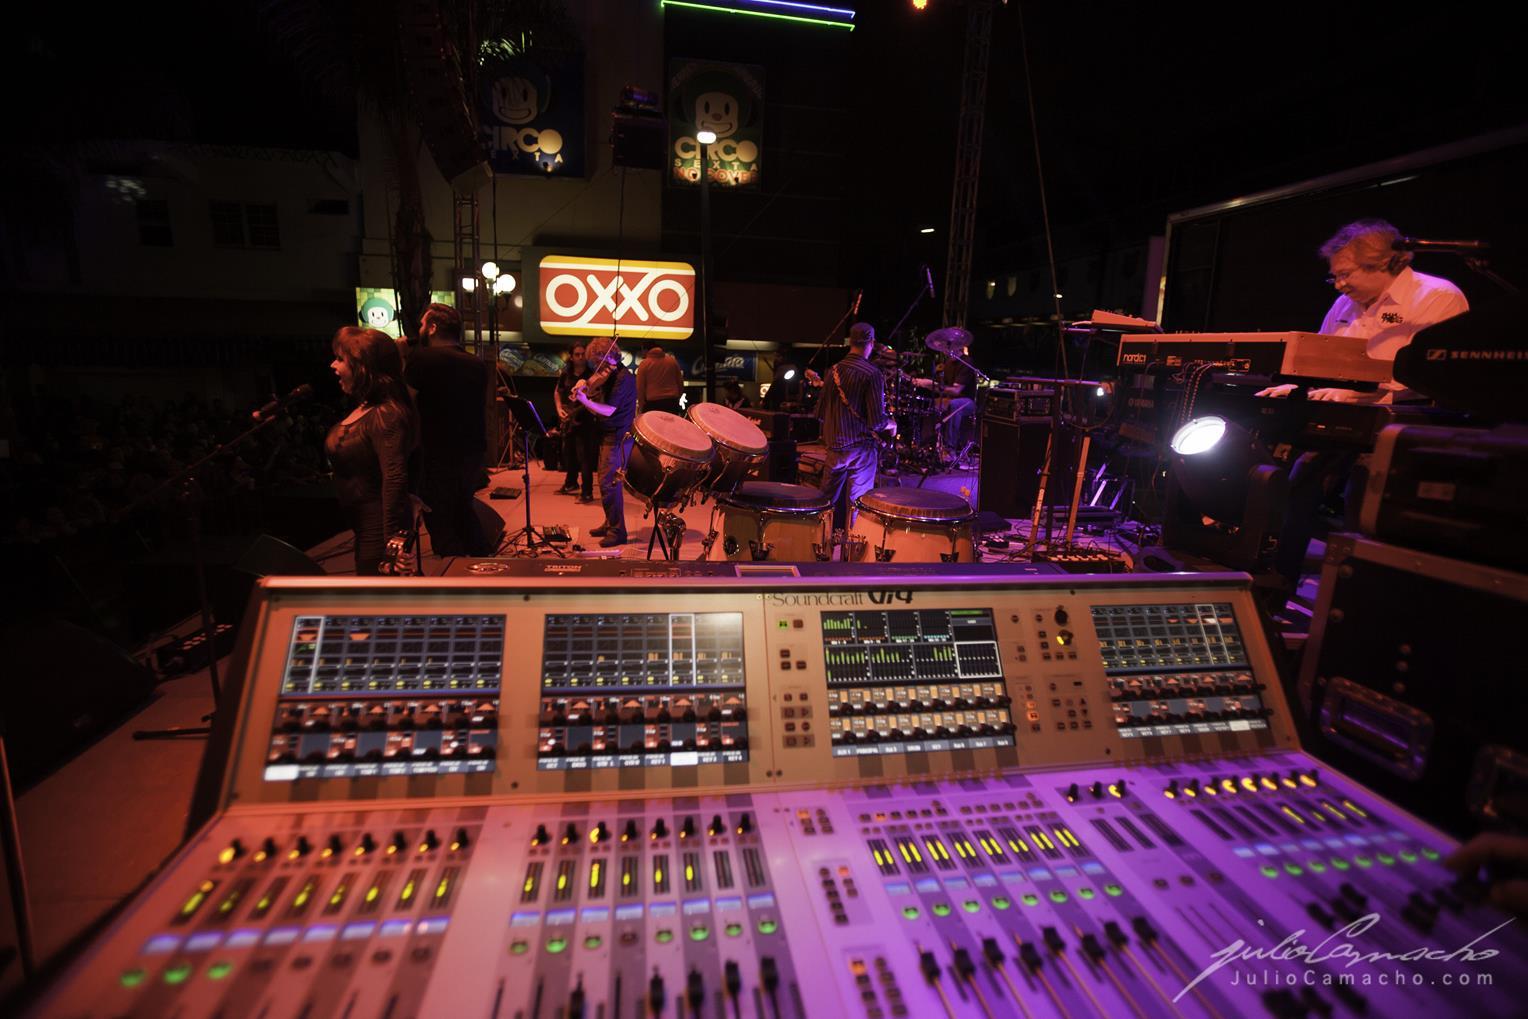 2014-10-30 31 CAST TOUR Ensenada y Tijuana - 1703 - www.Juli (Copy).jpg